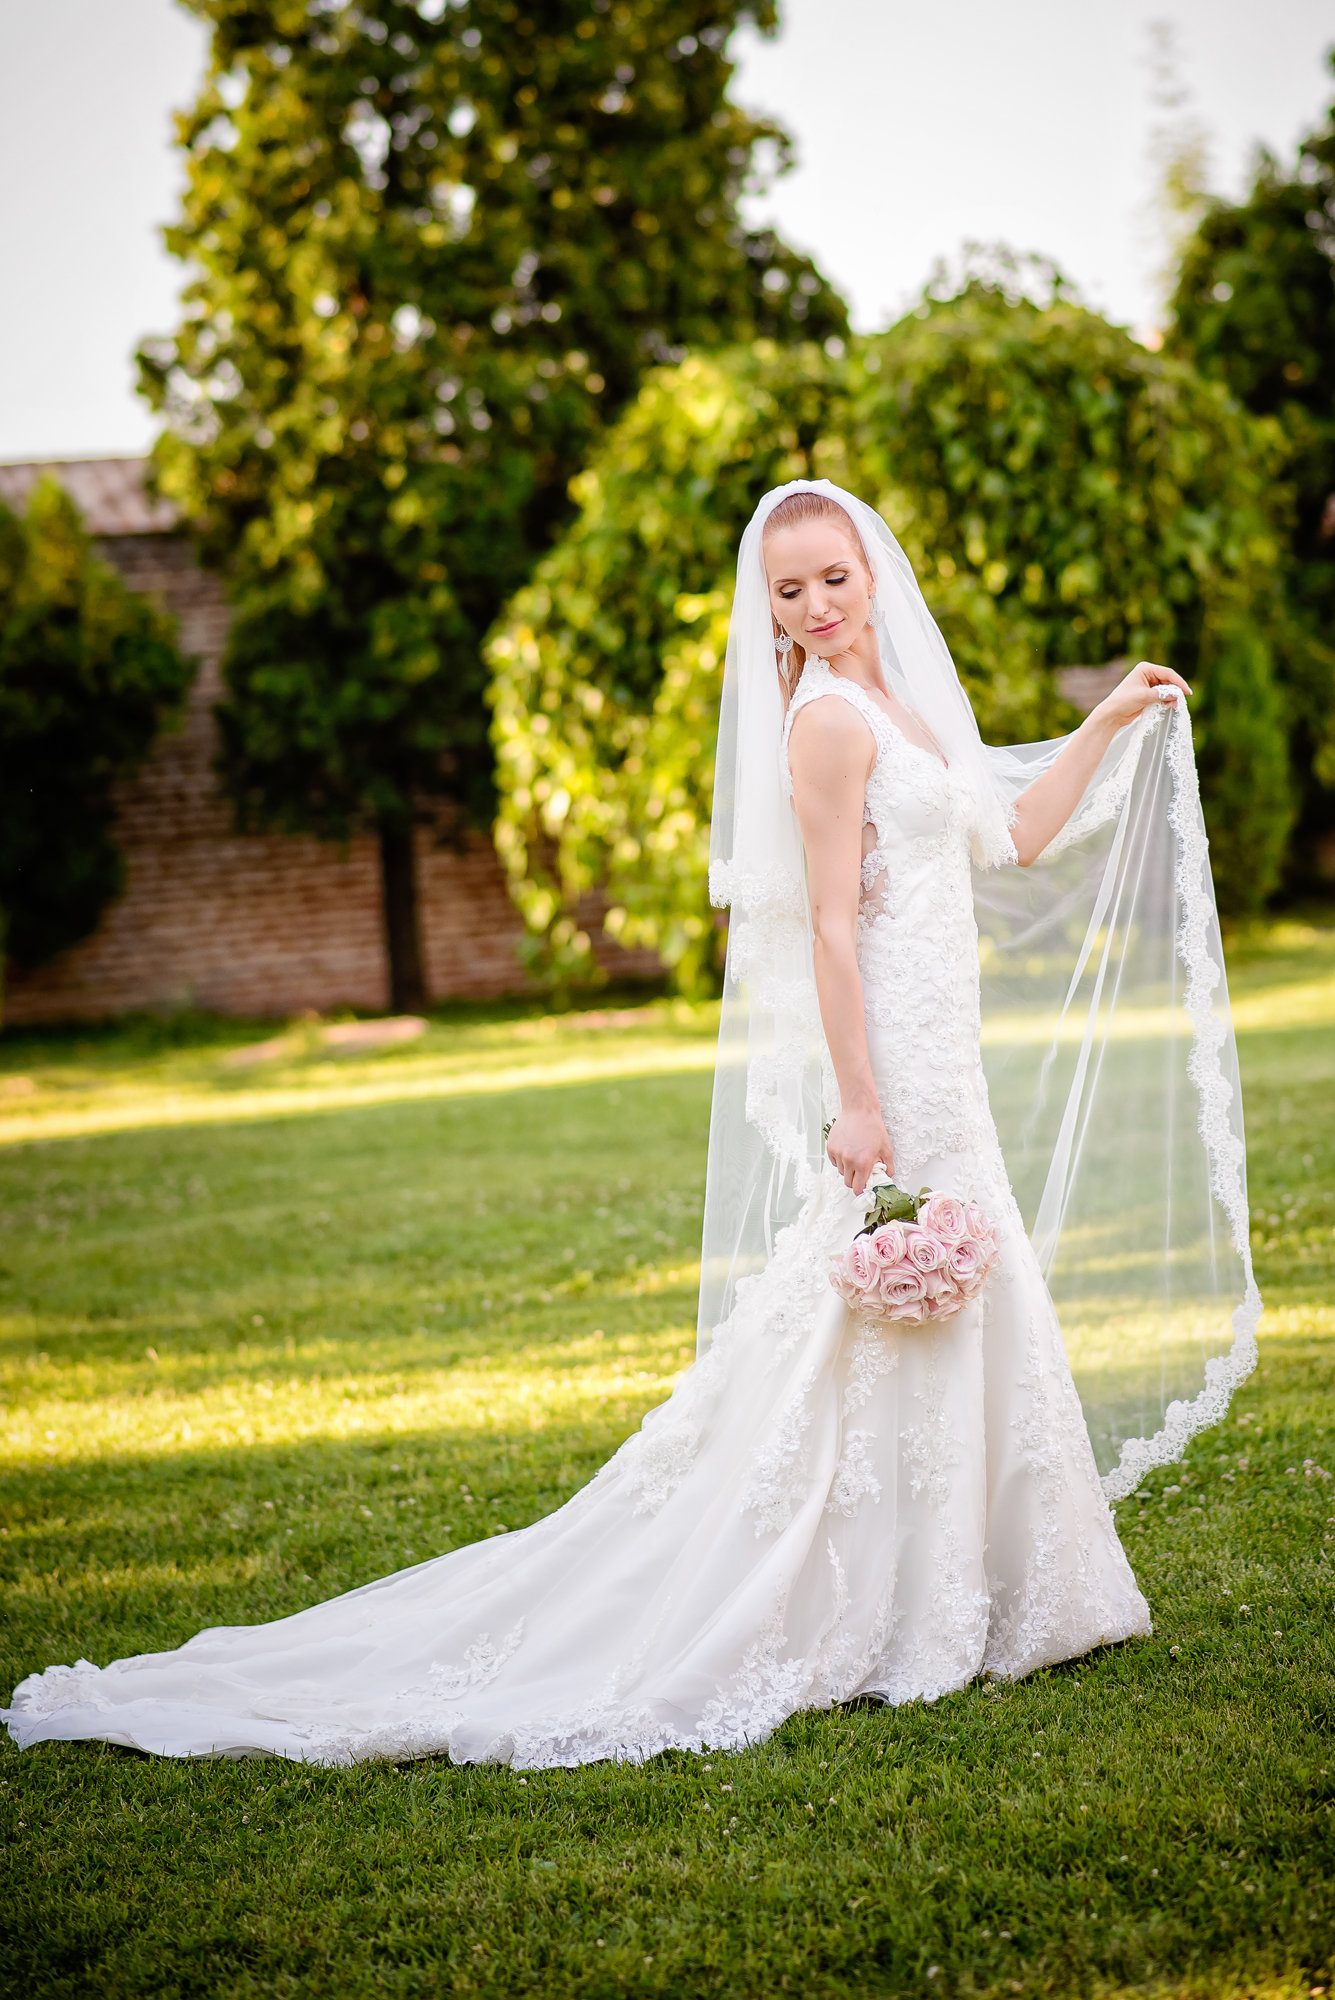 alexandru madalina wedding day 26